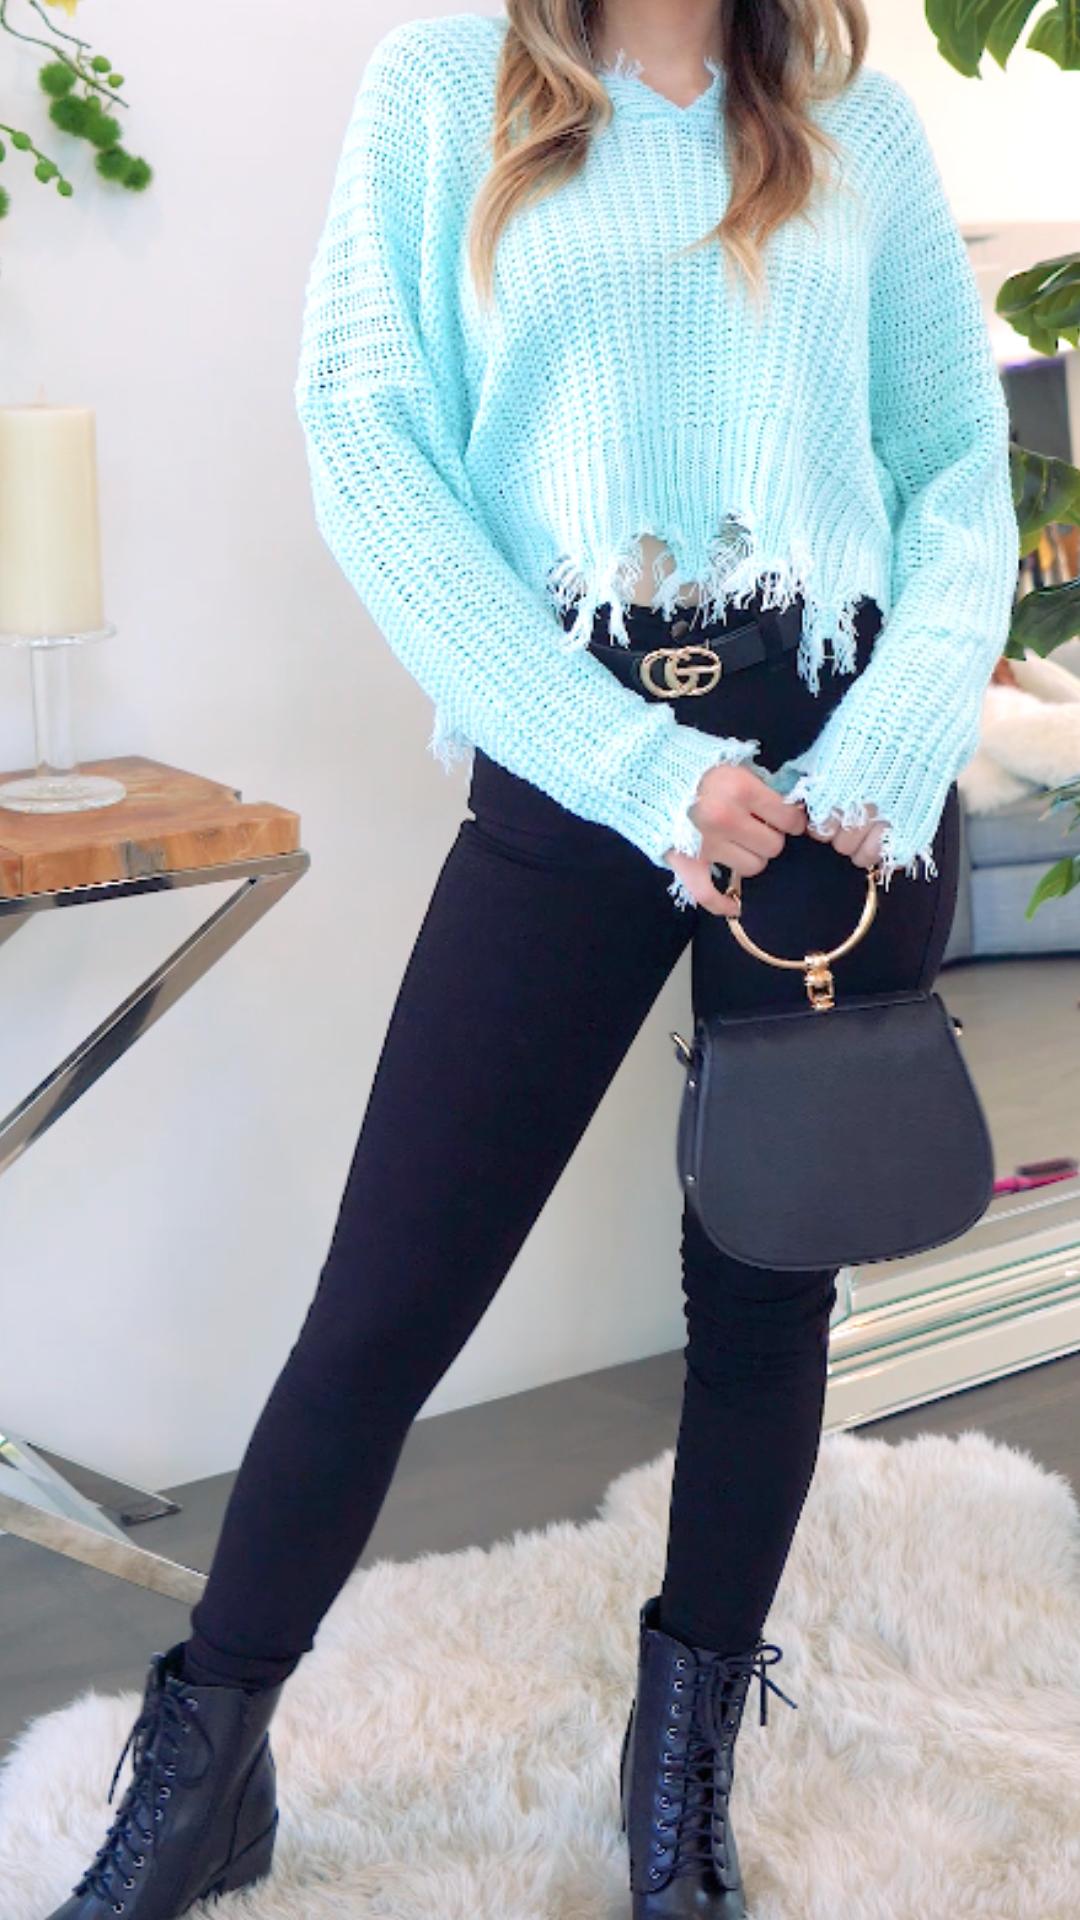 4 simple ways to style black jeans! #OOTD